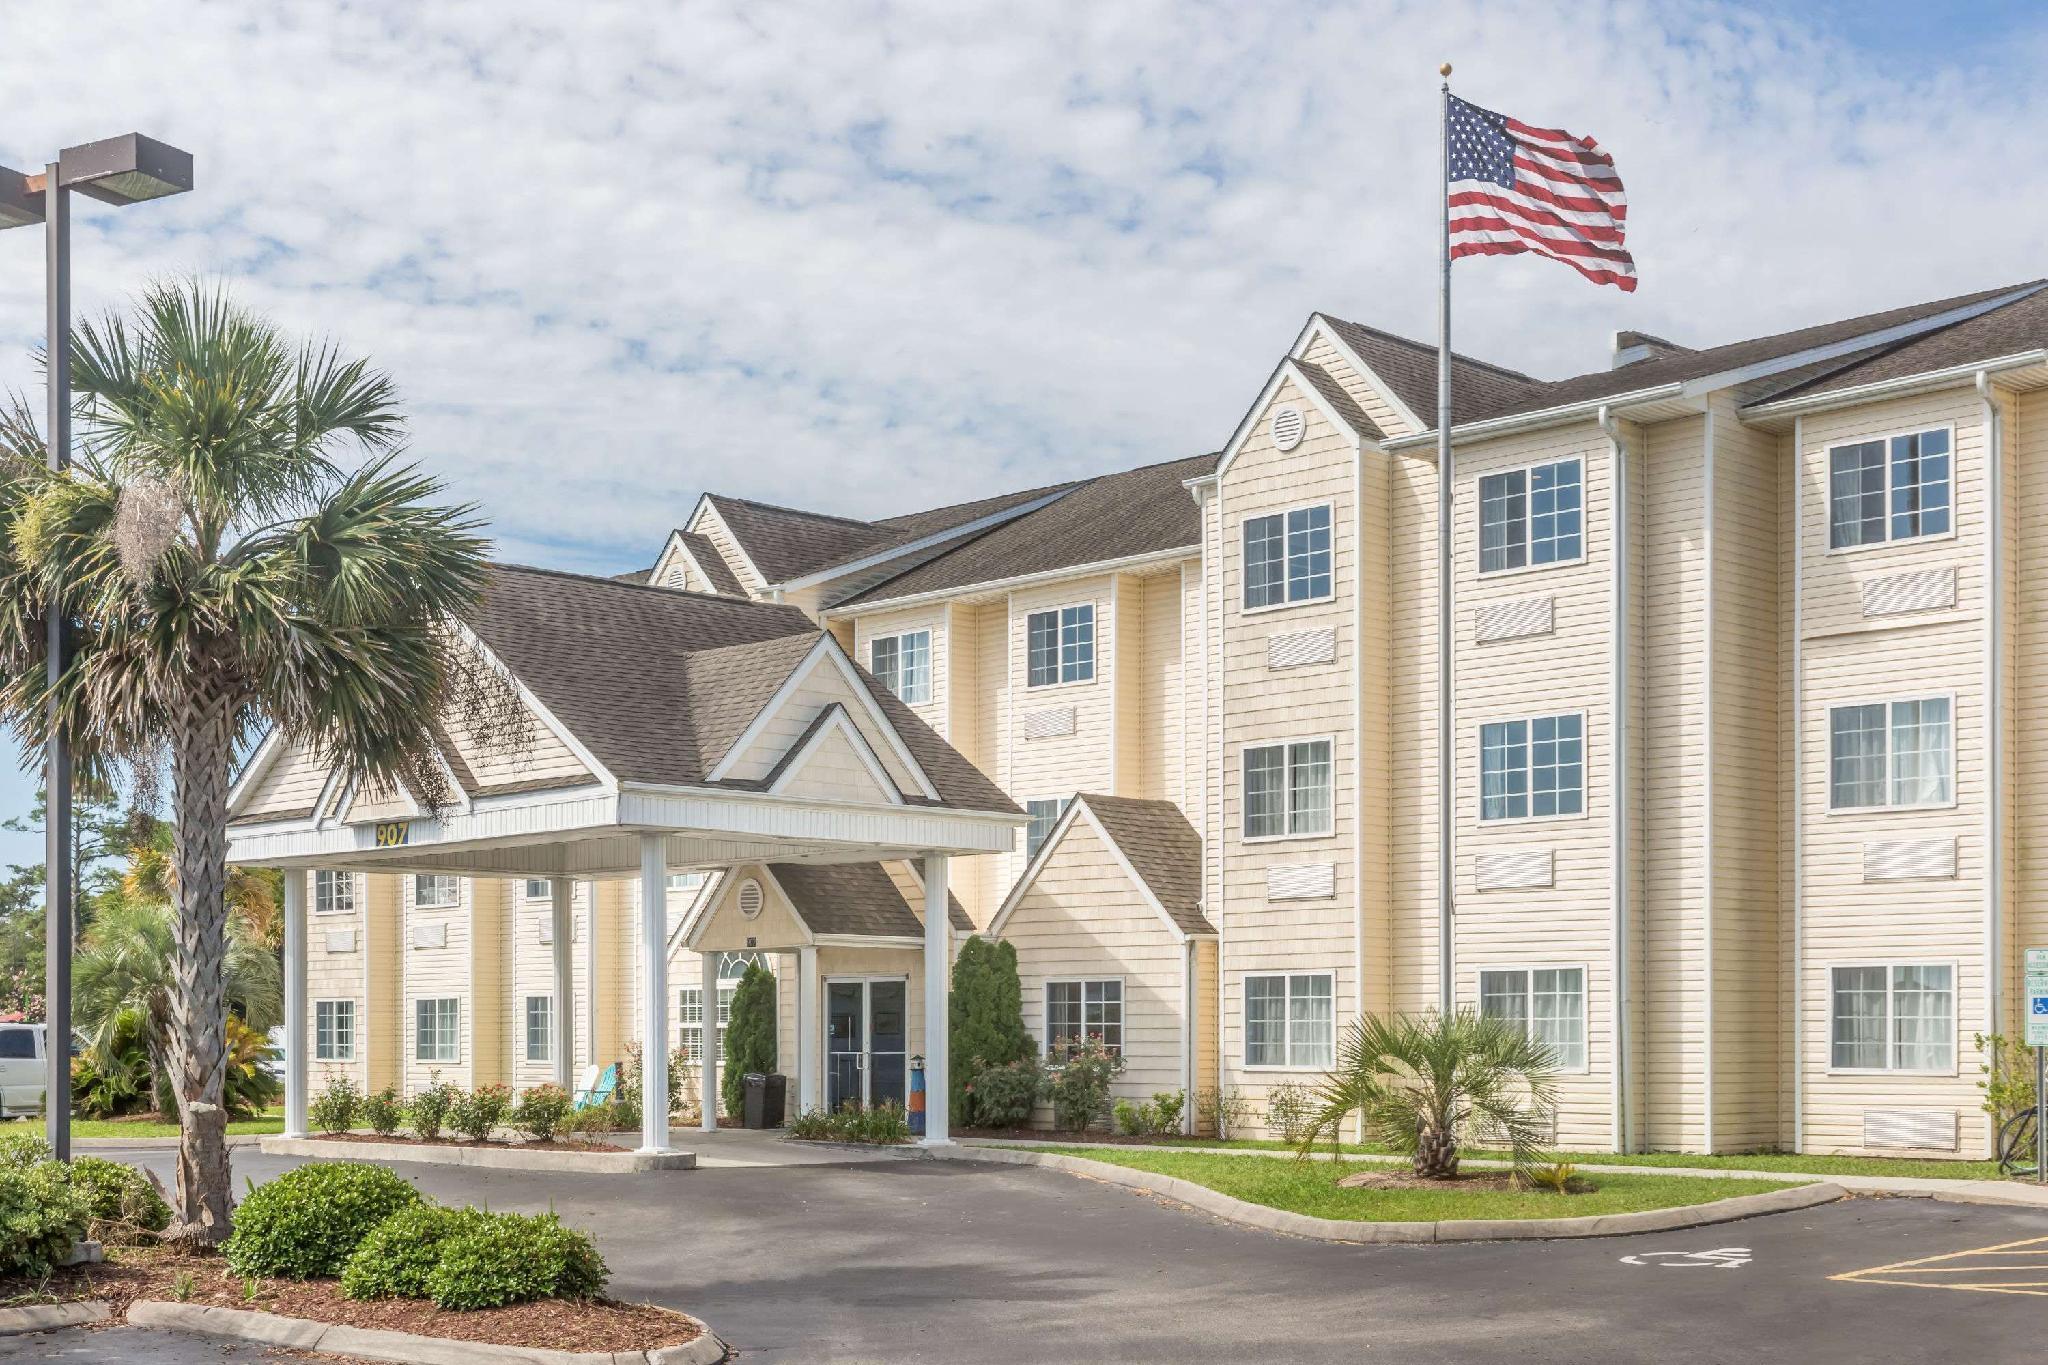 Microtel Inn And Suites By Wyndham Carolina Beach